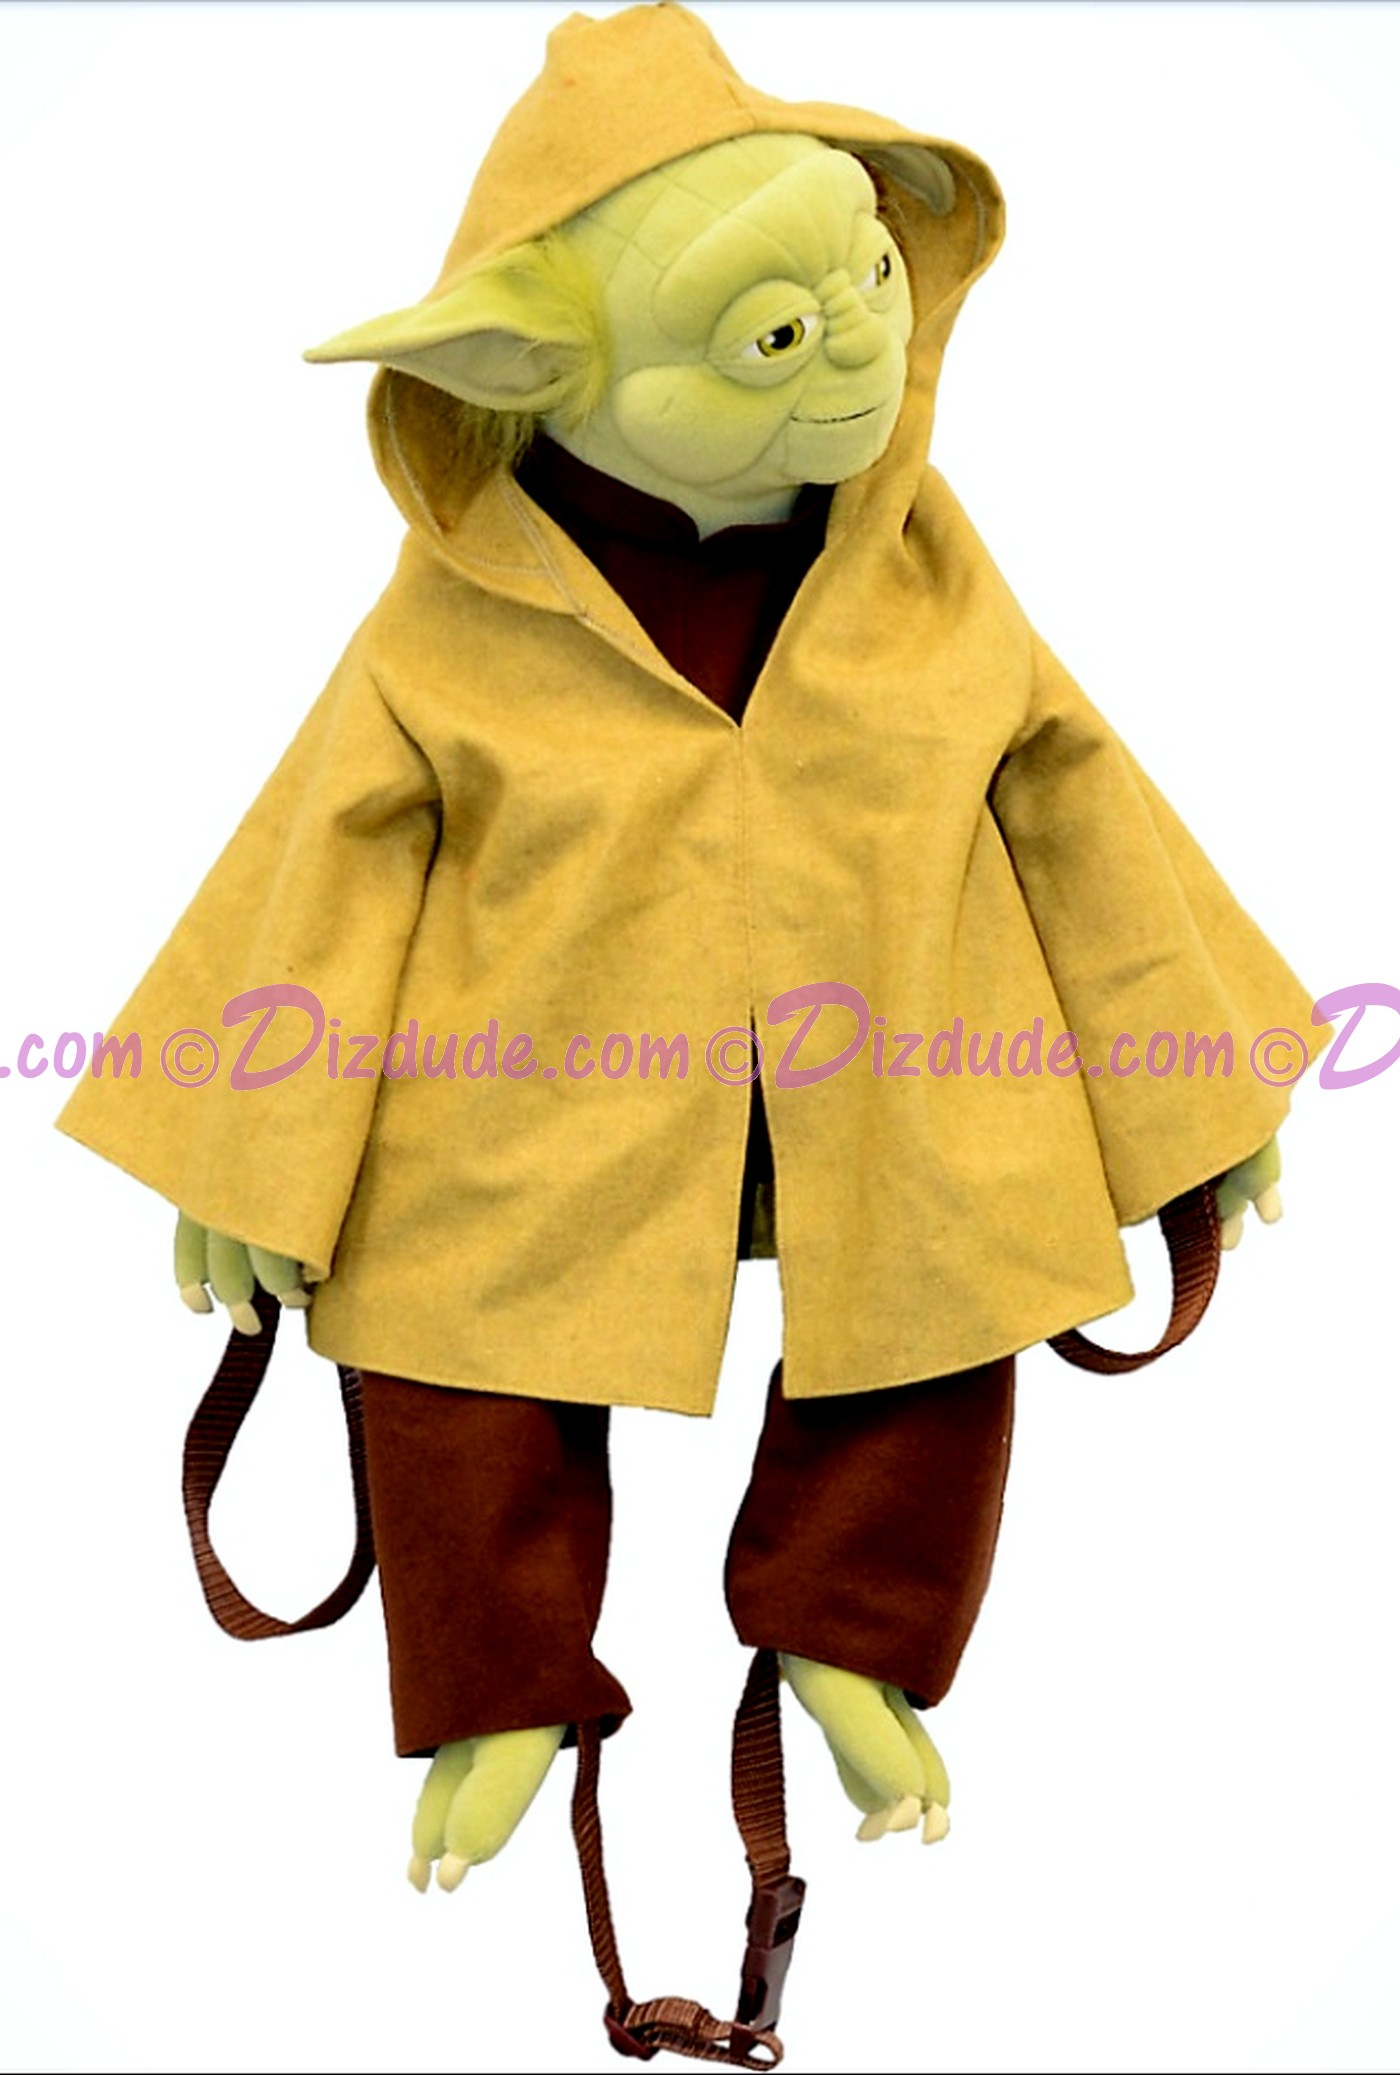 Disney Star Wars Yoda Plush Backpack © Dizdude.com